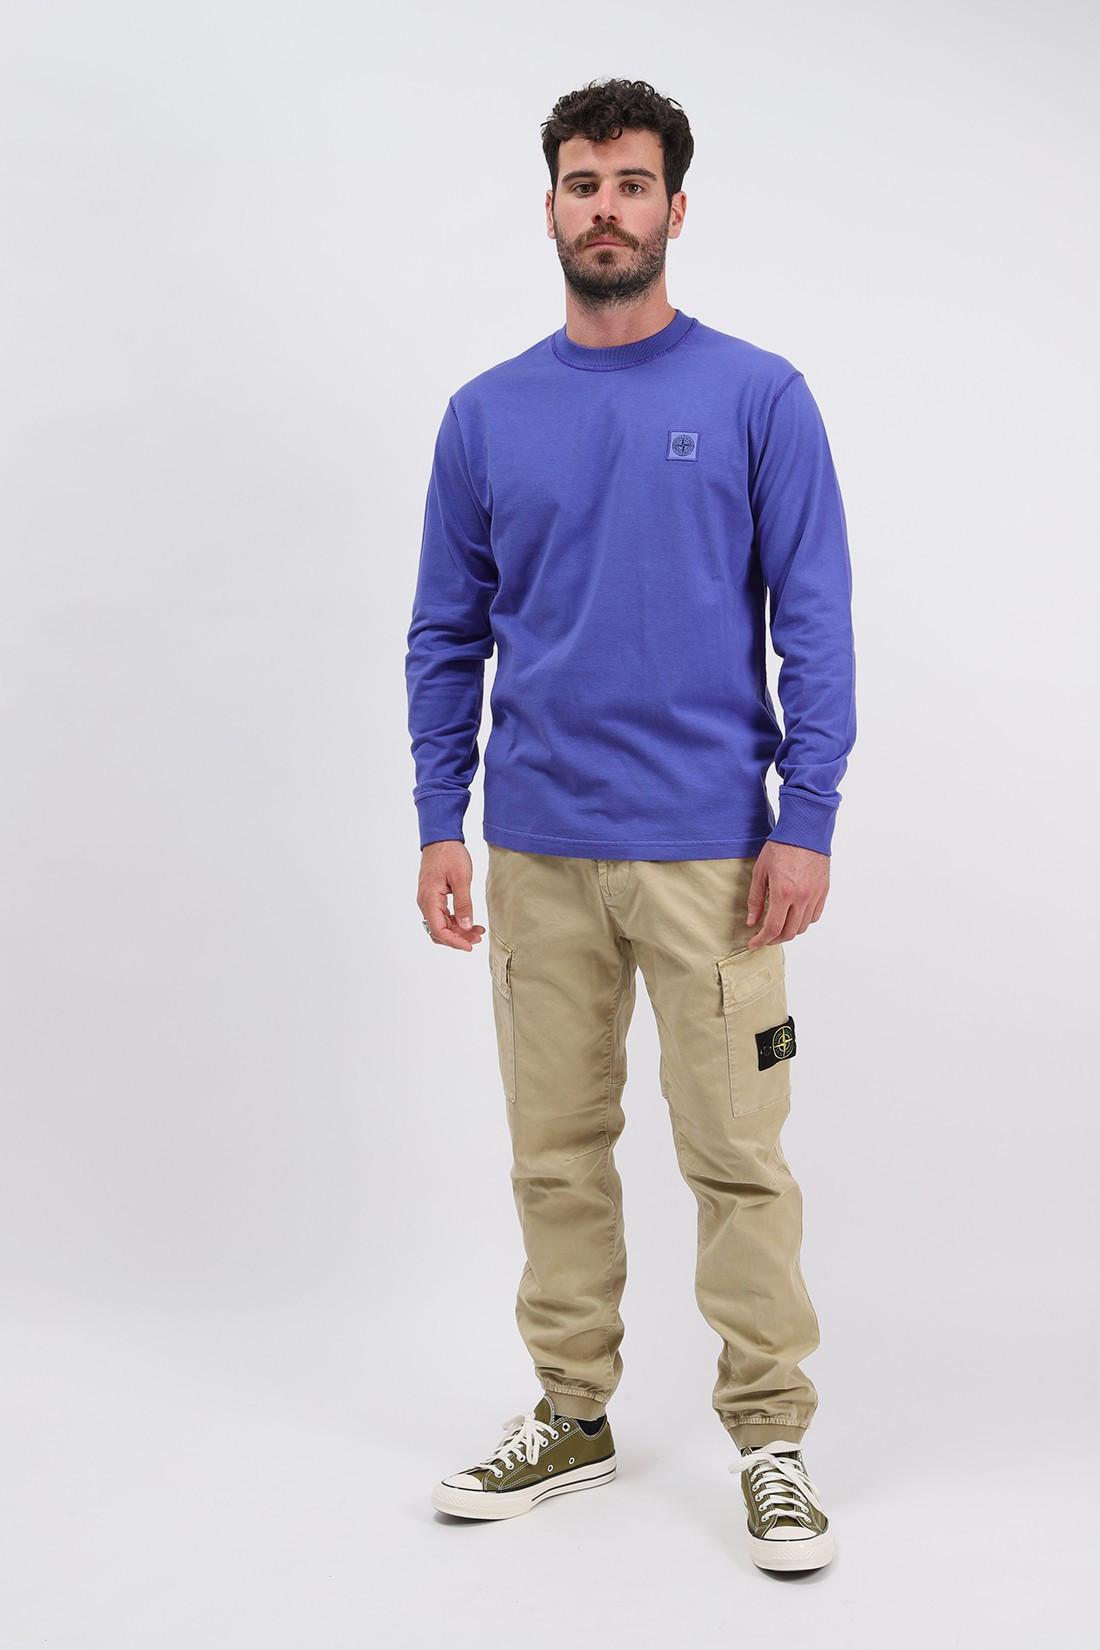 STONE ISLAND / 21842 ls fissato t shirt v0043 Pervinca